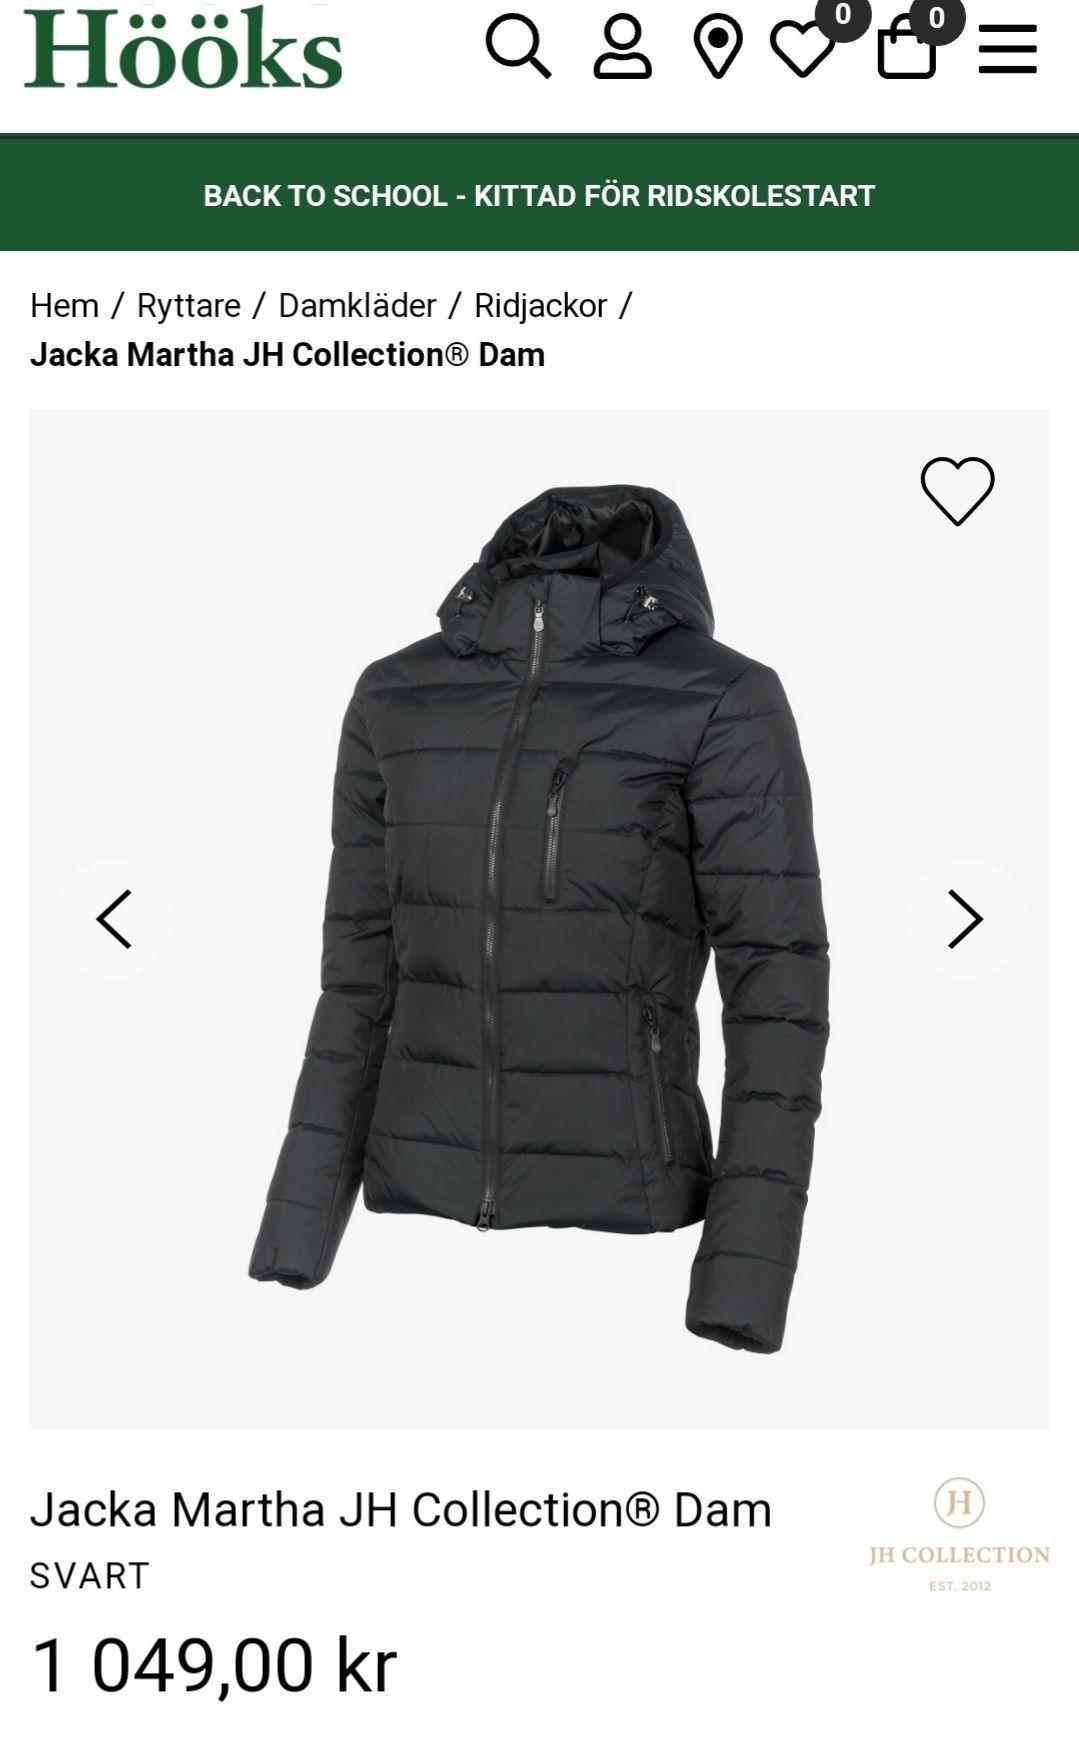 Jacka Martha JH Collection® Dam